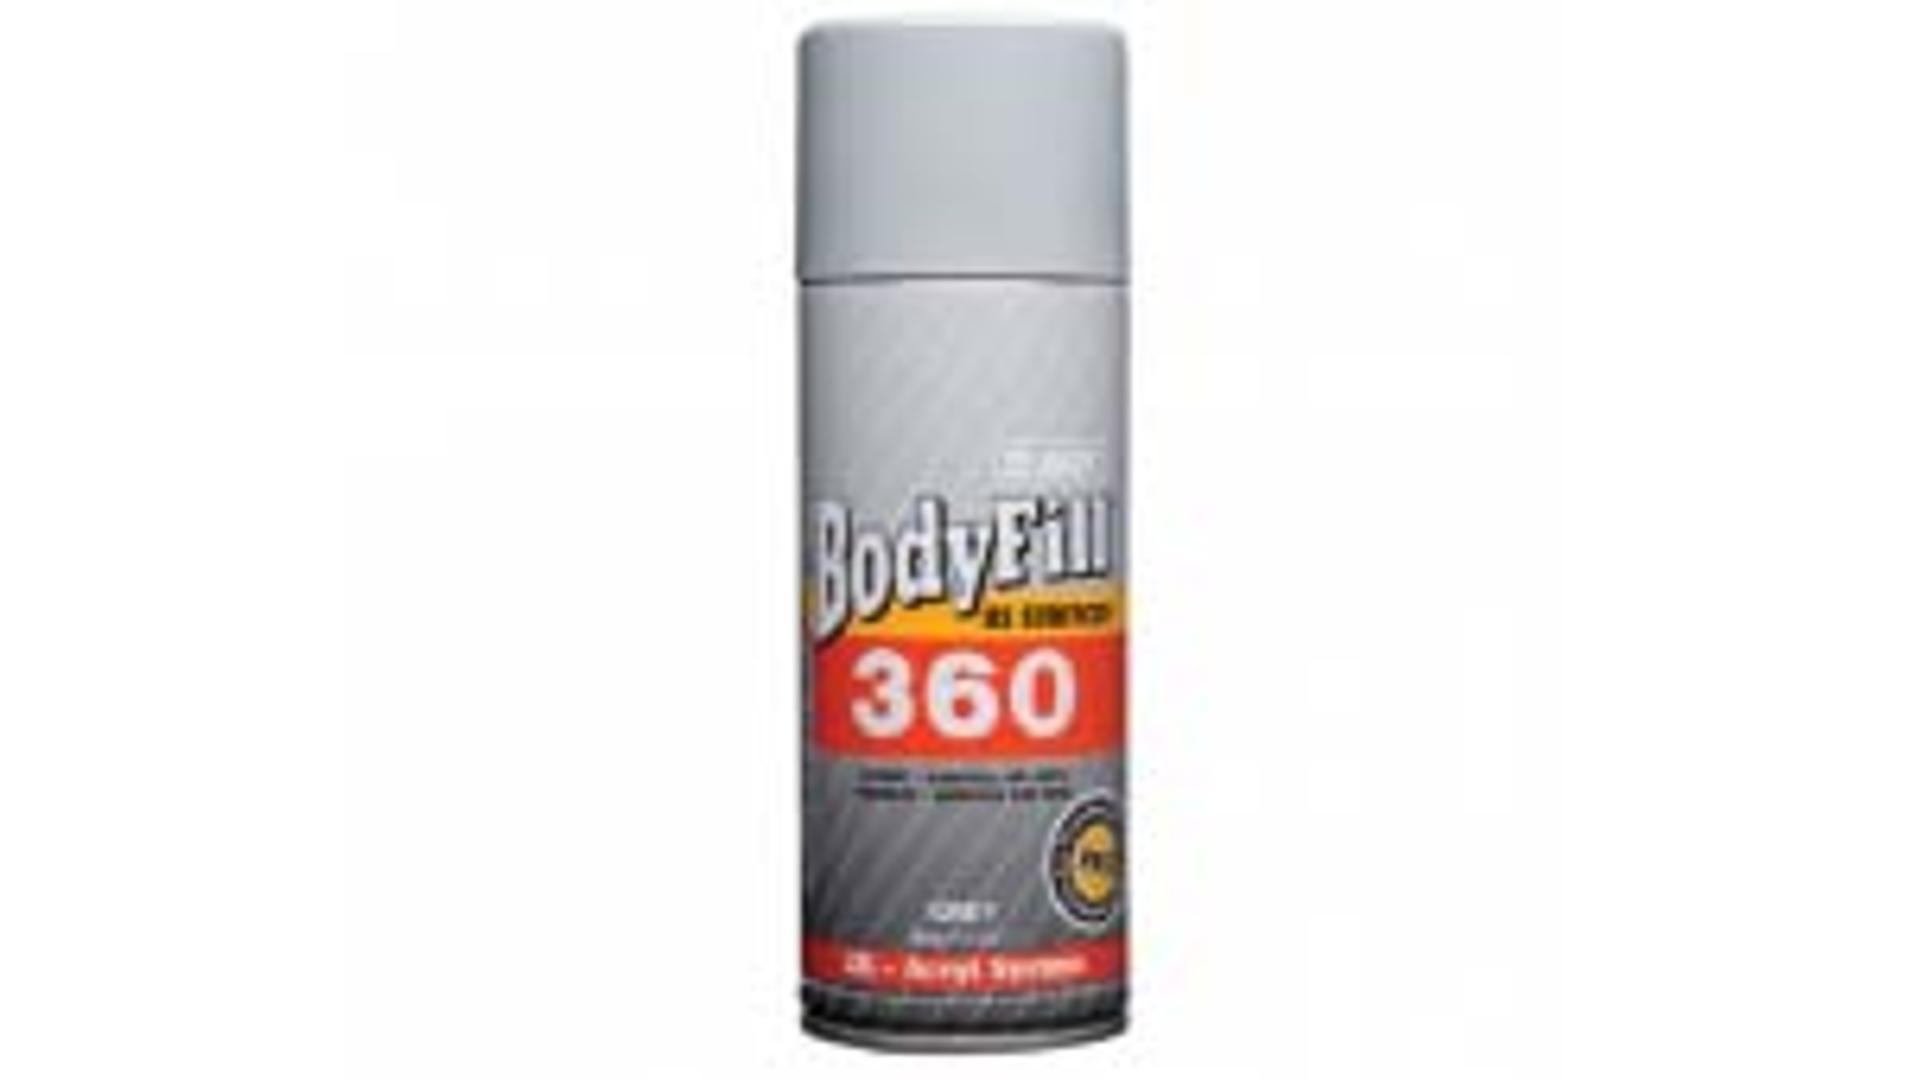 HB BODY fill 360 (2: 1) plnič / antikorozní základ ve spreji bílý 400ml